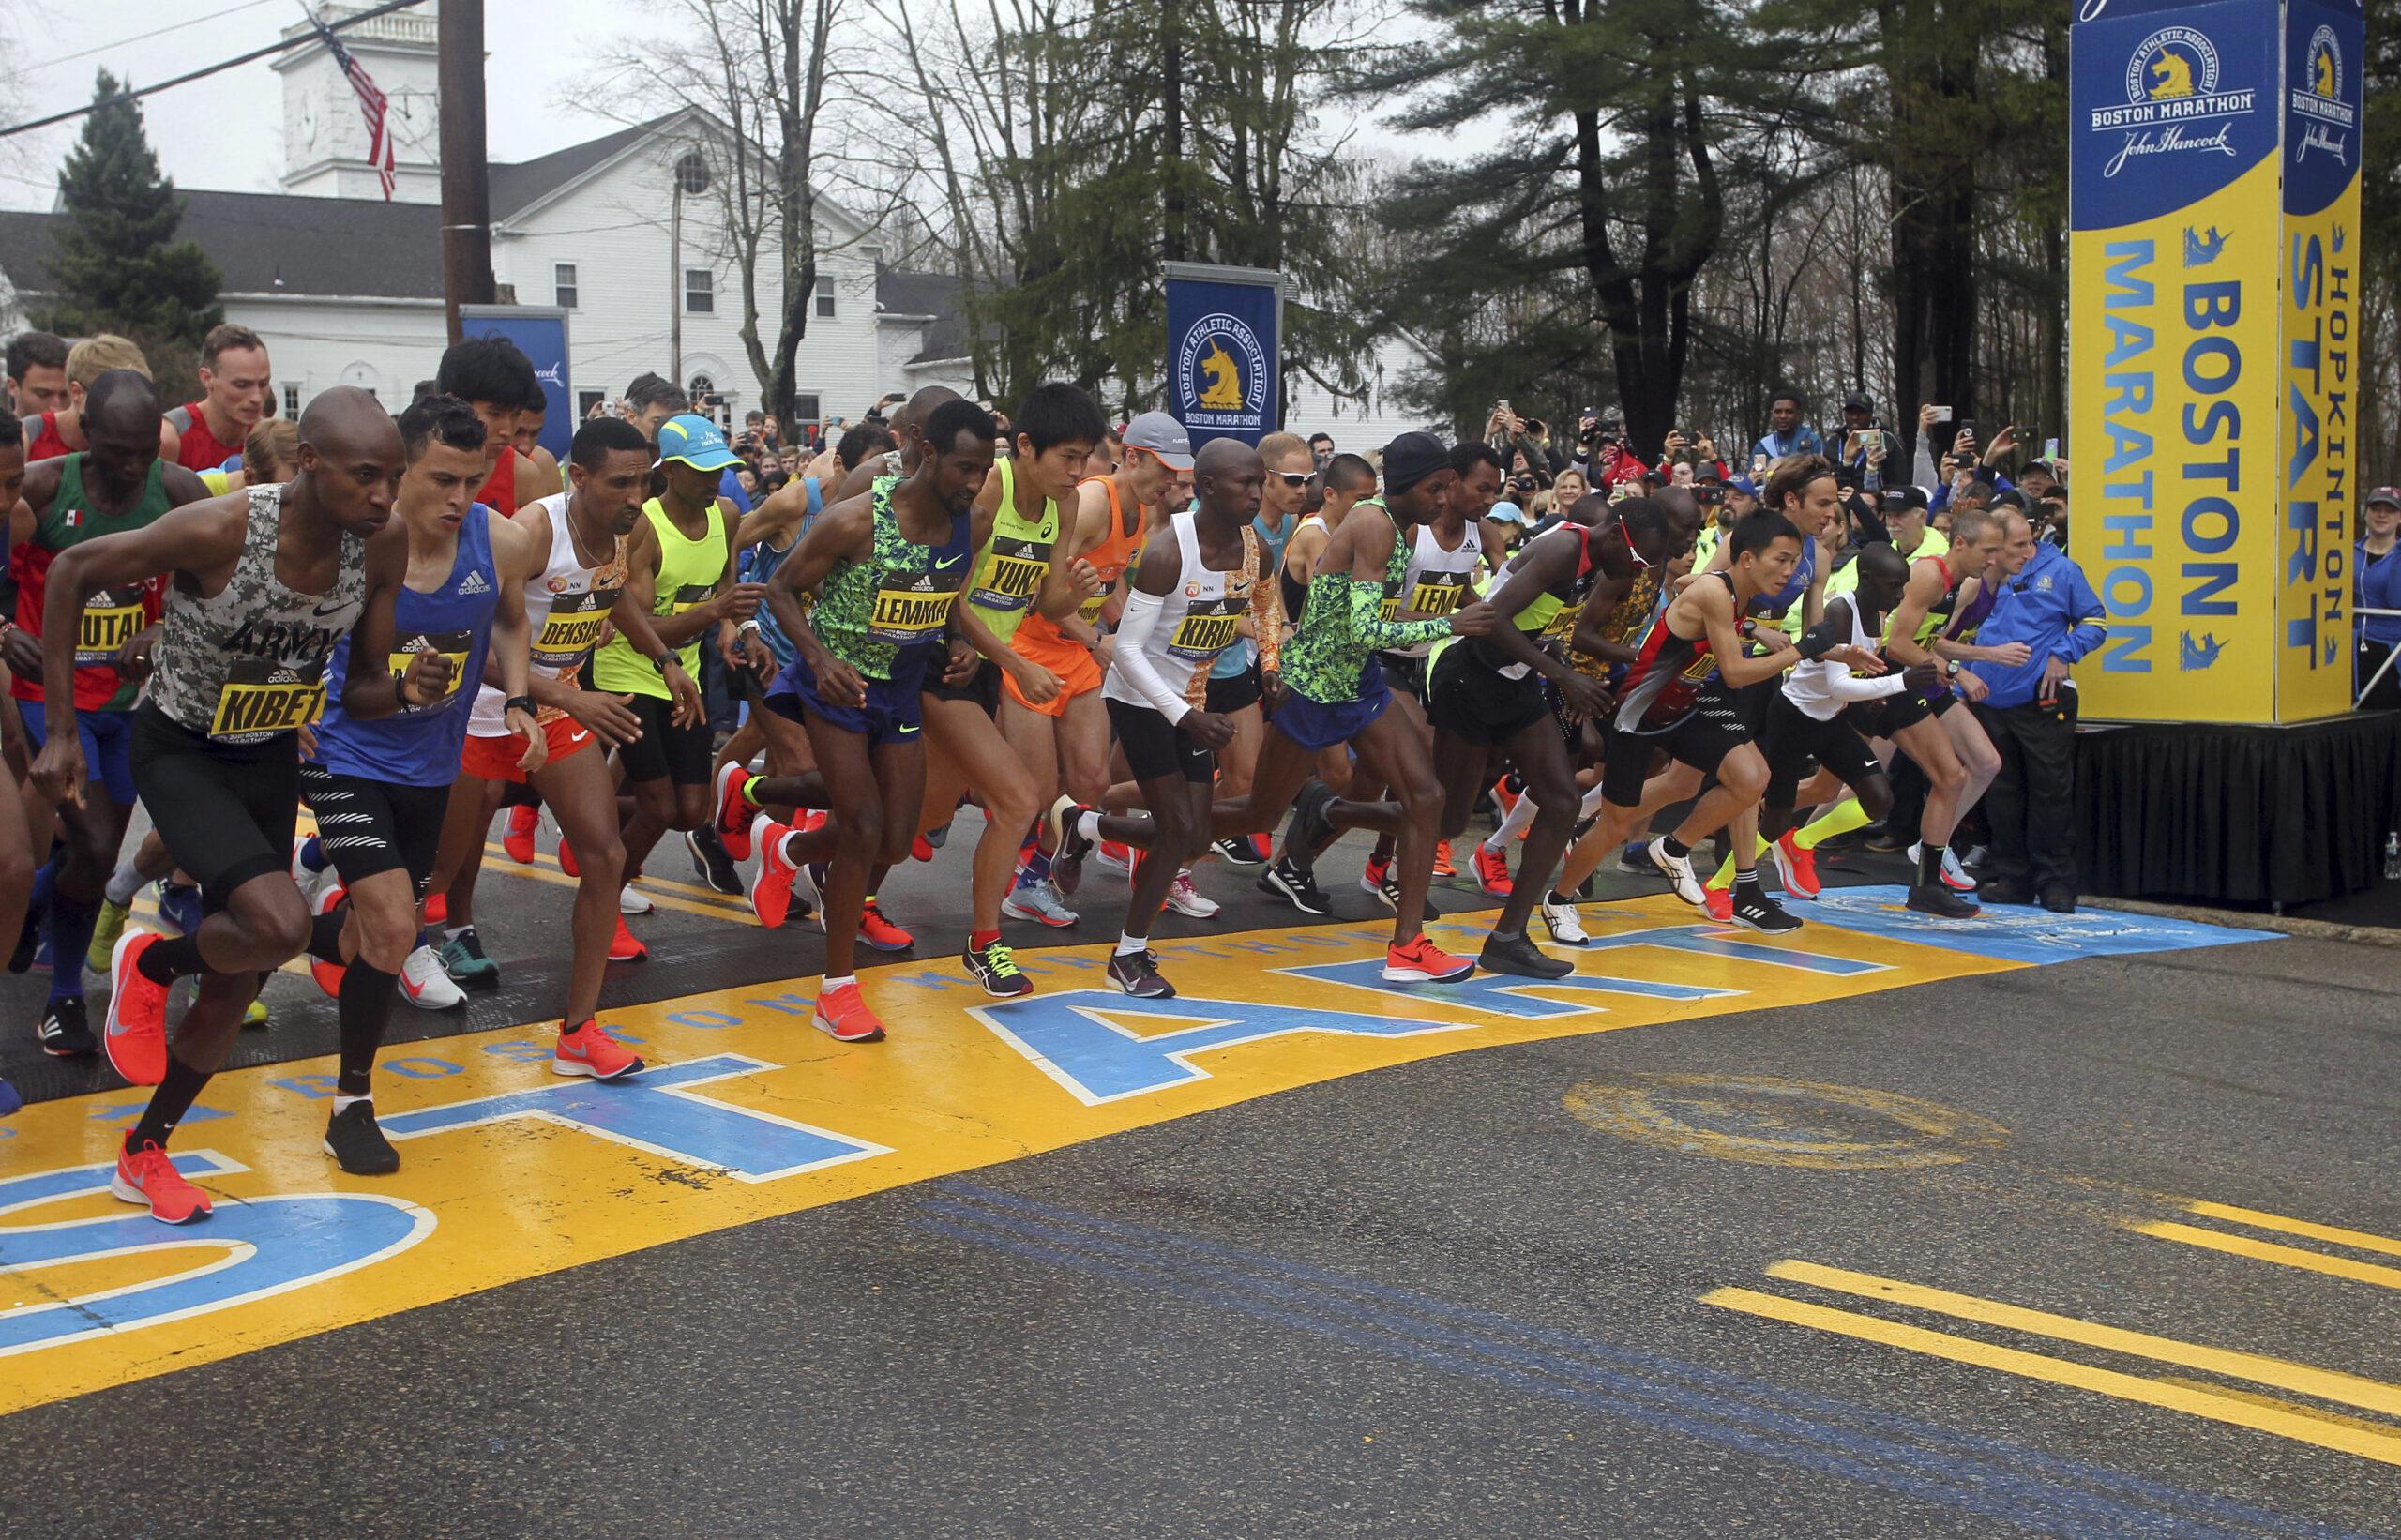 Virus Outbreak Boston Marathon